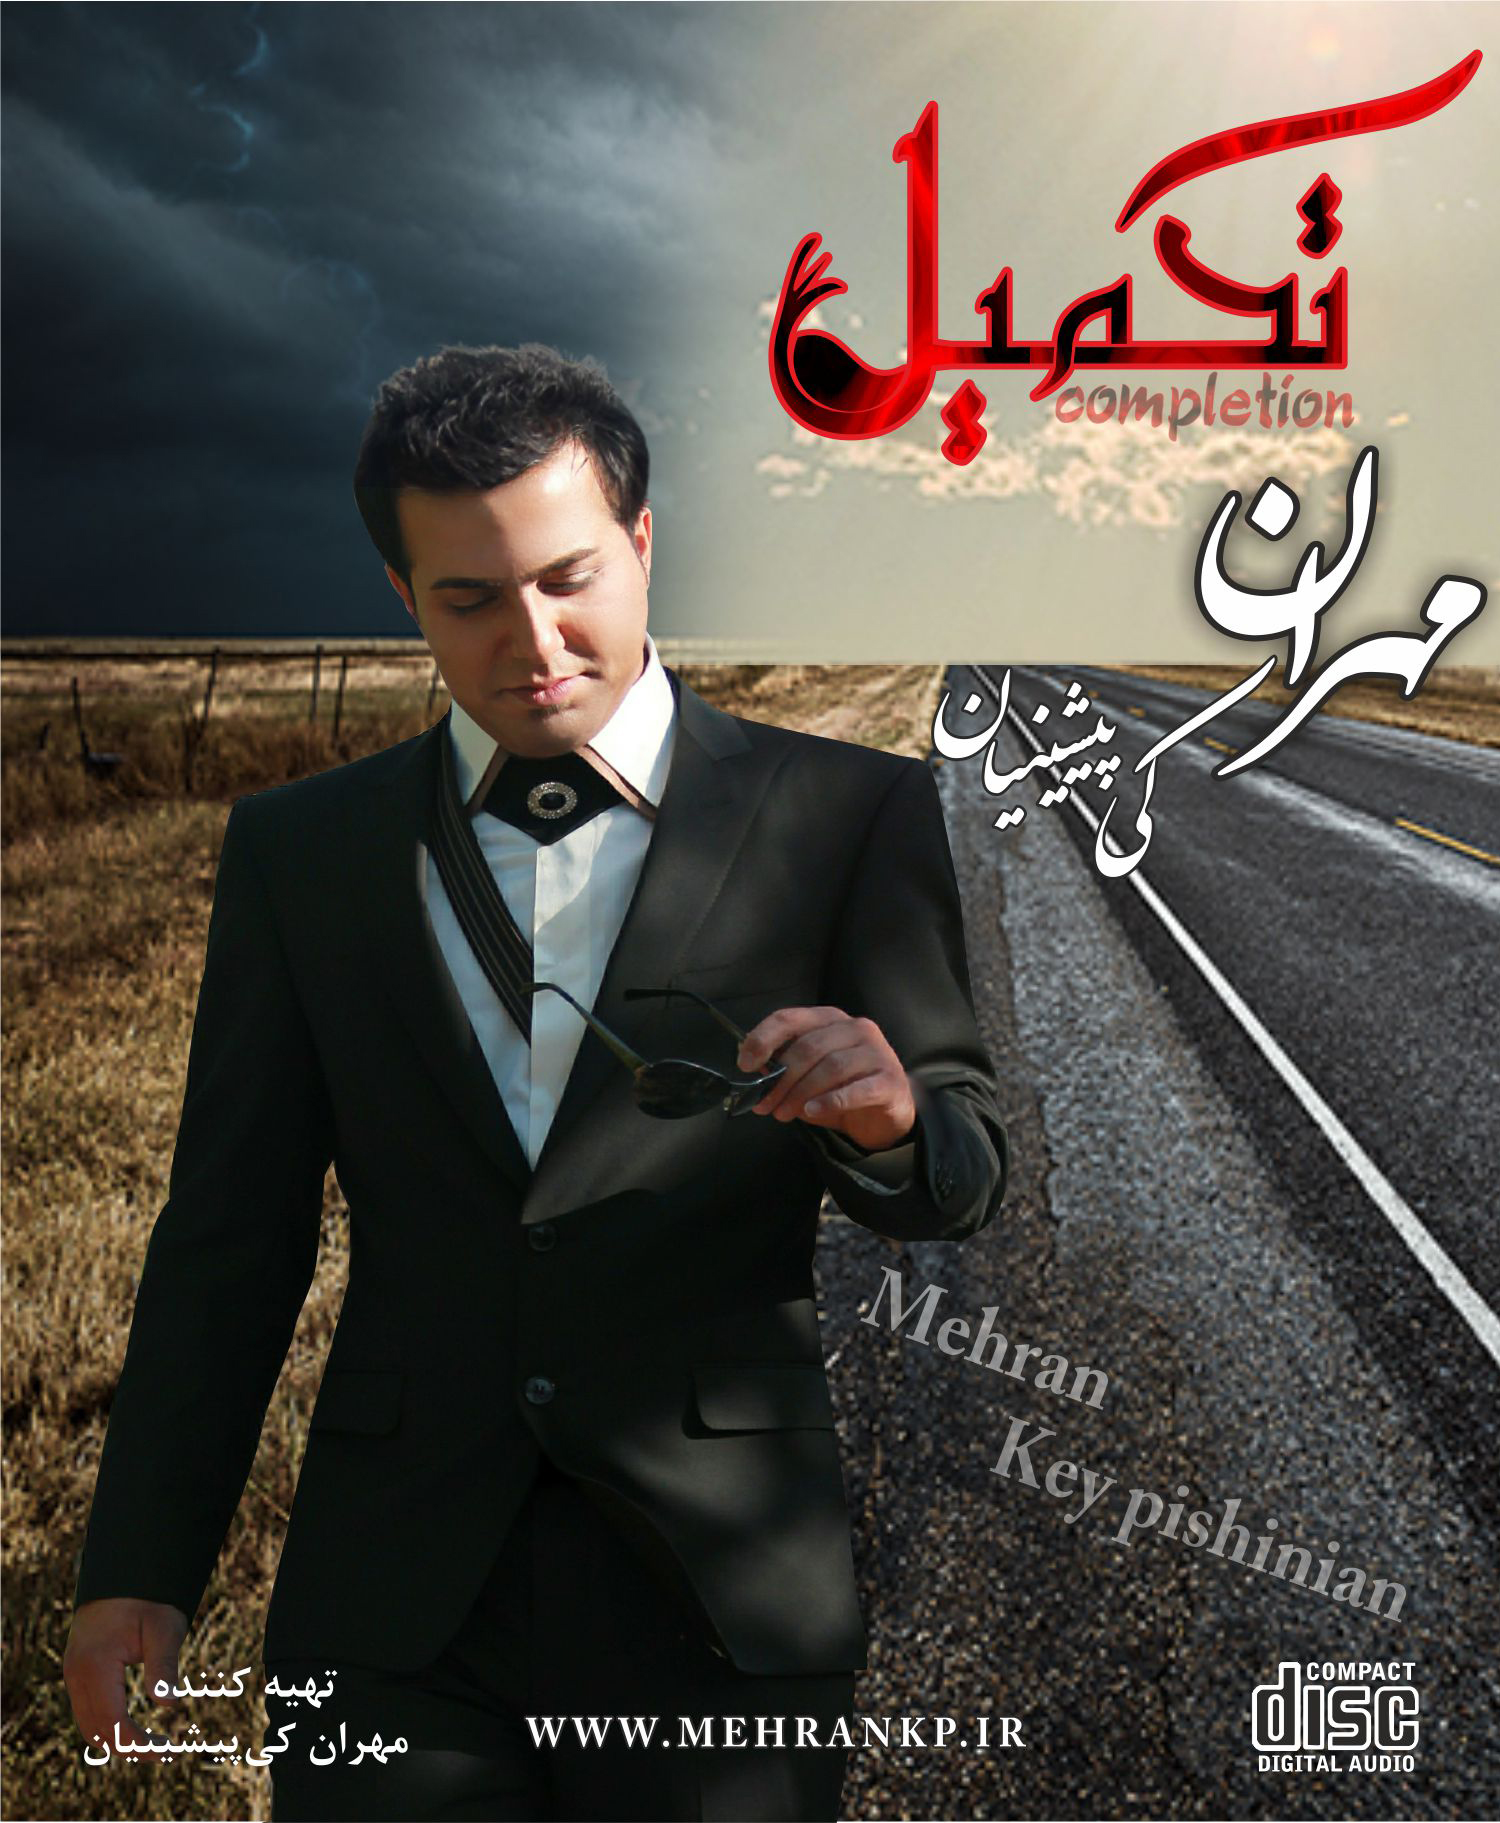 Mehran Keypishinian – Takmil (Demo Album)